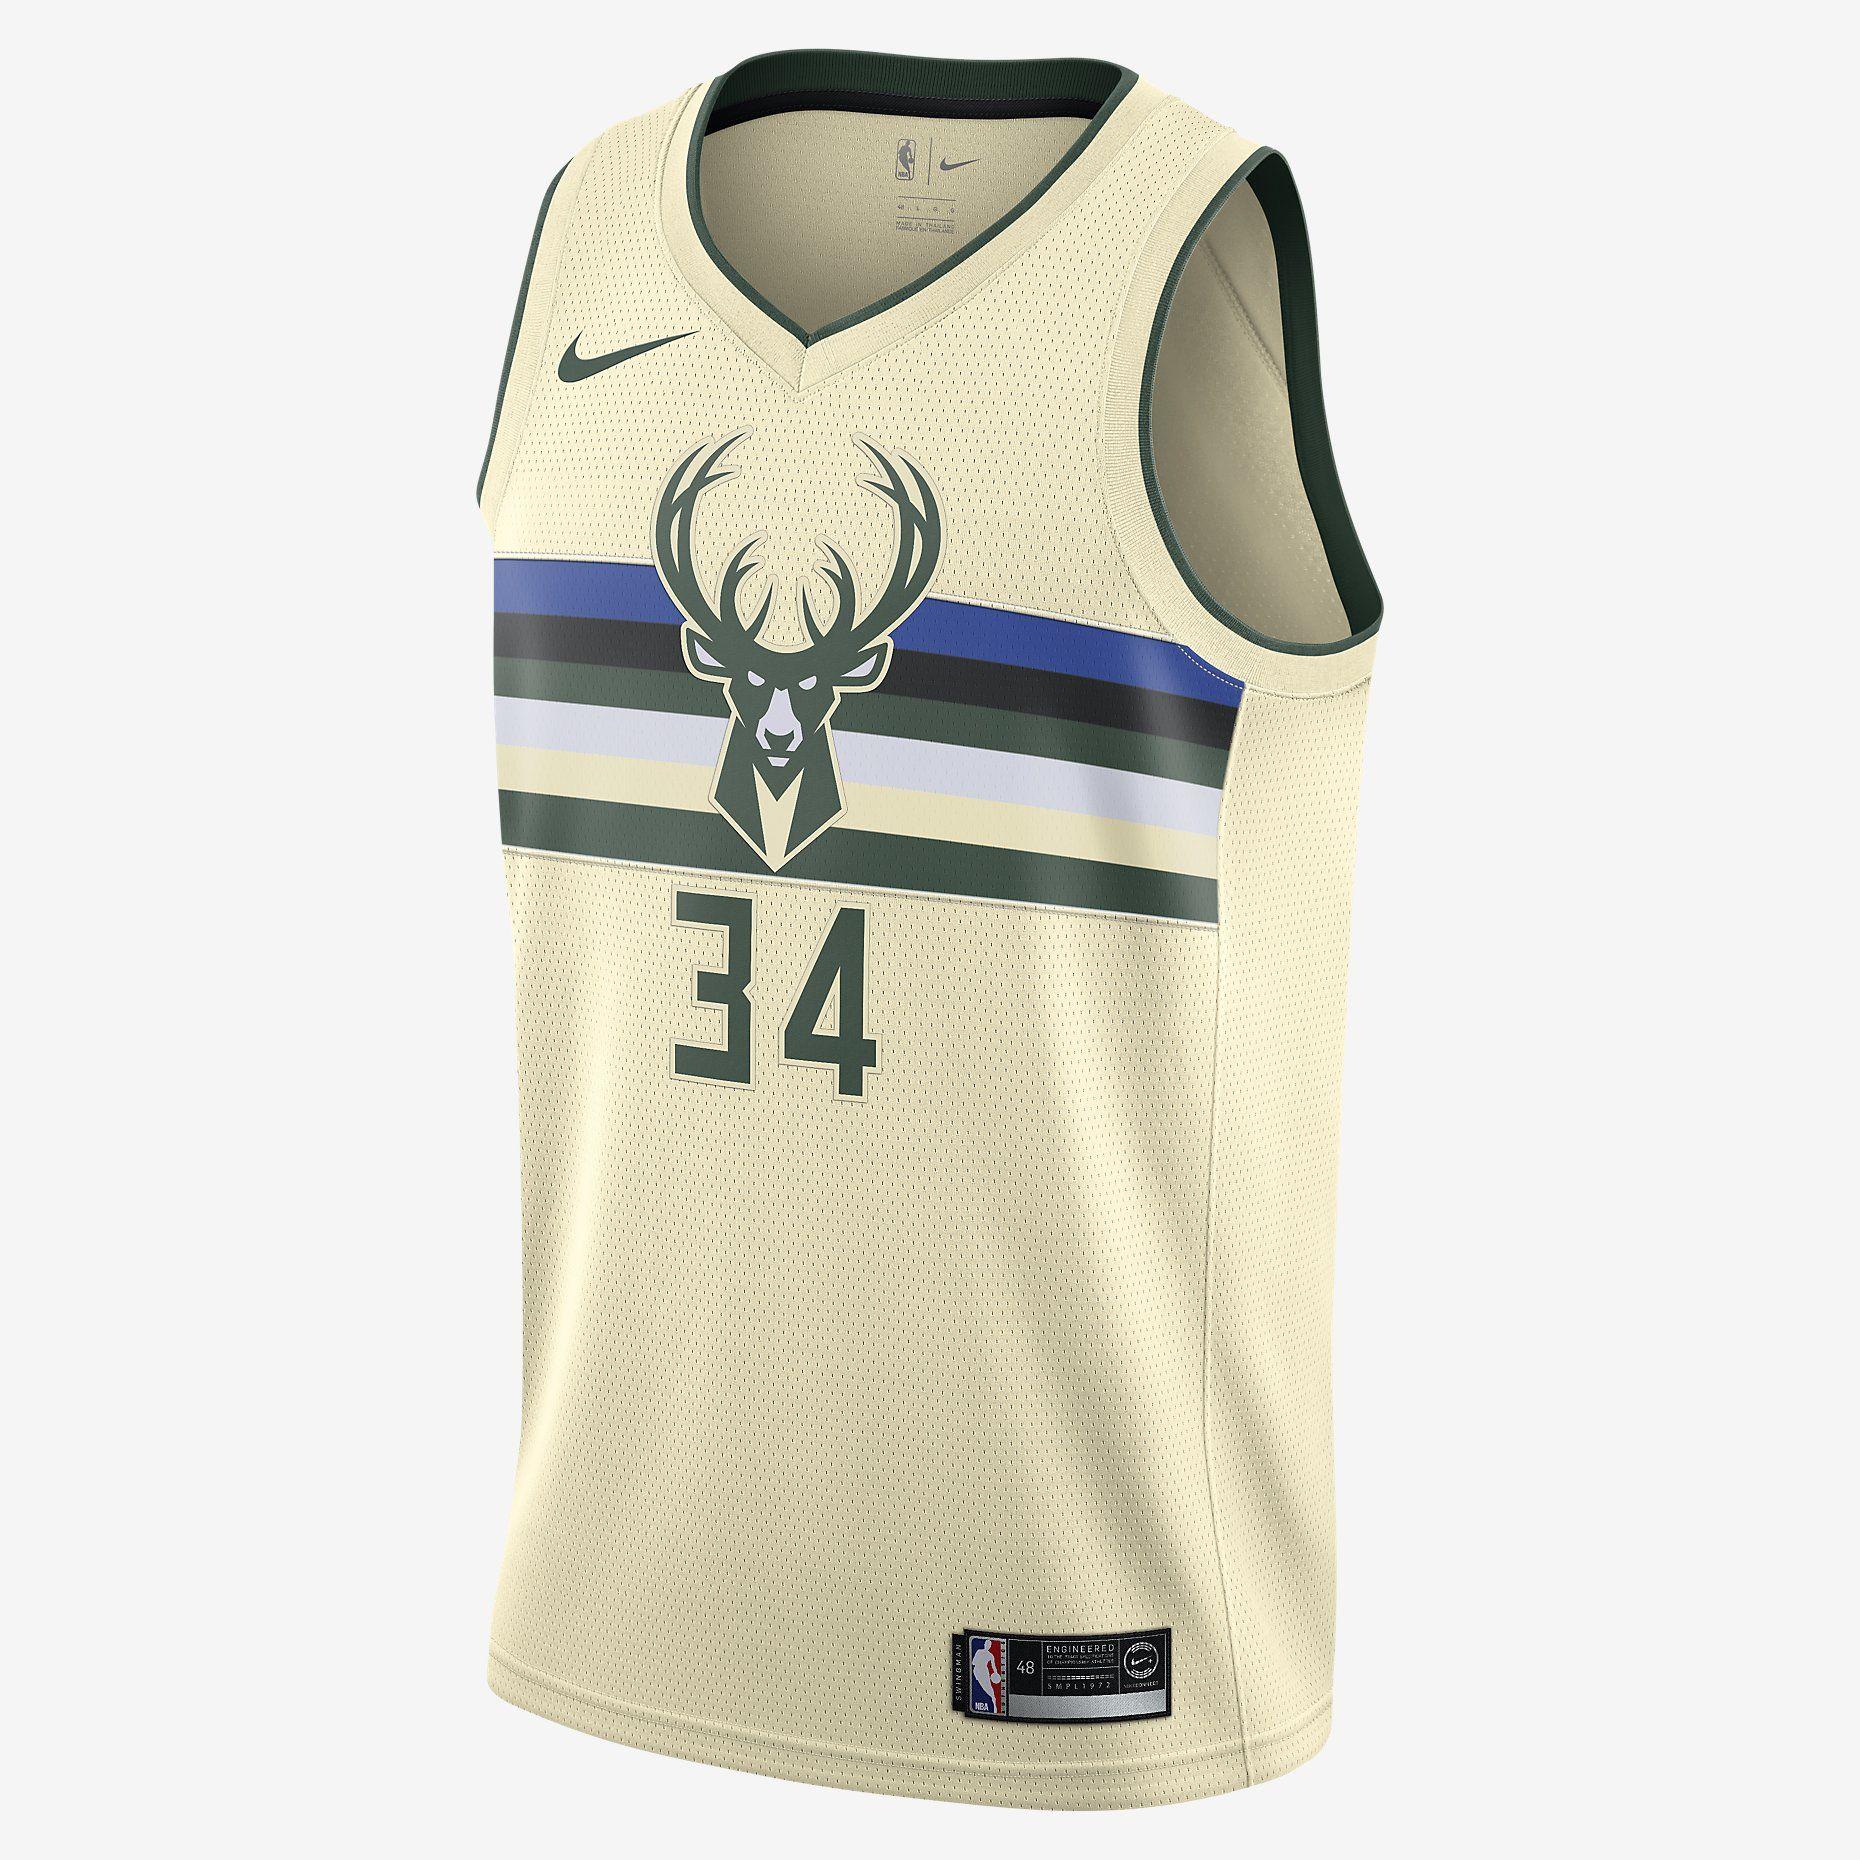 59451a372c8 110   Giannis Antetokounmpo City Edition Swingman Jersey (Milwaukee Bucks) Men s  Nike NBA Jersey